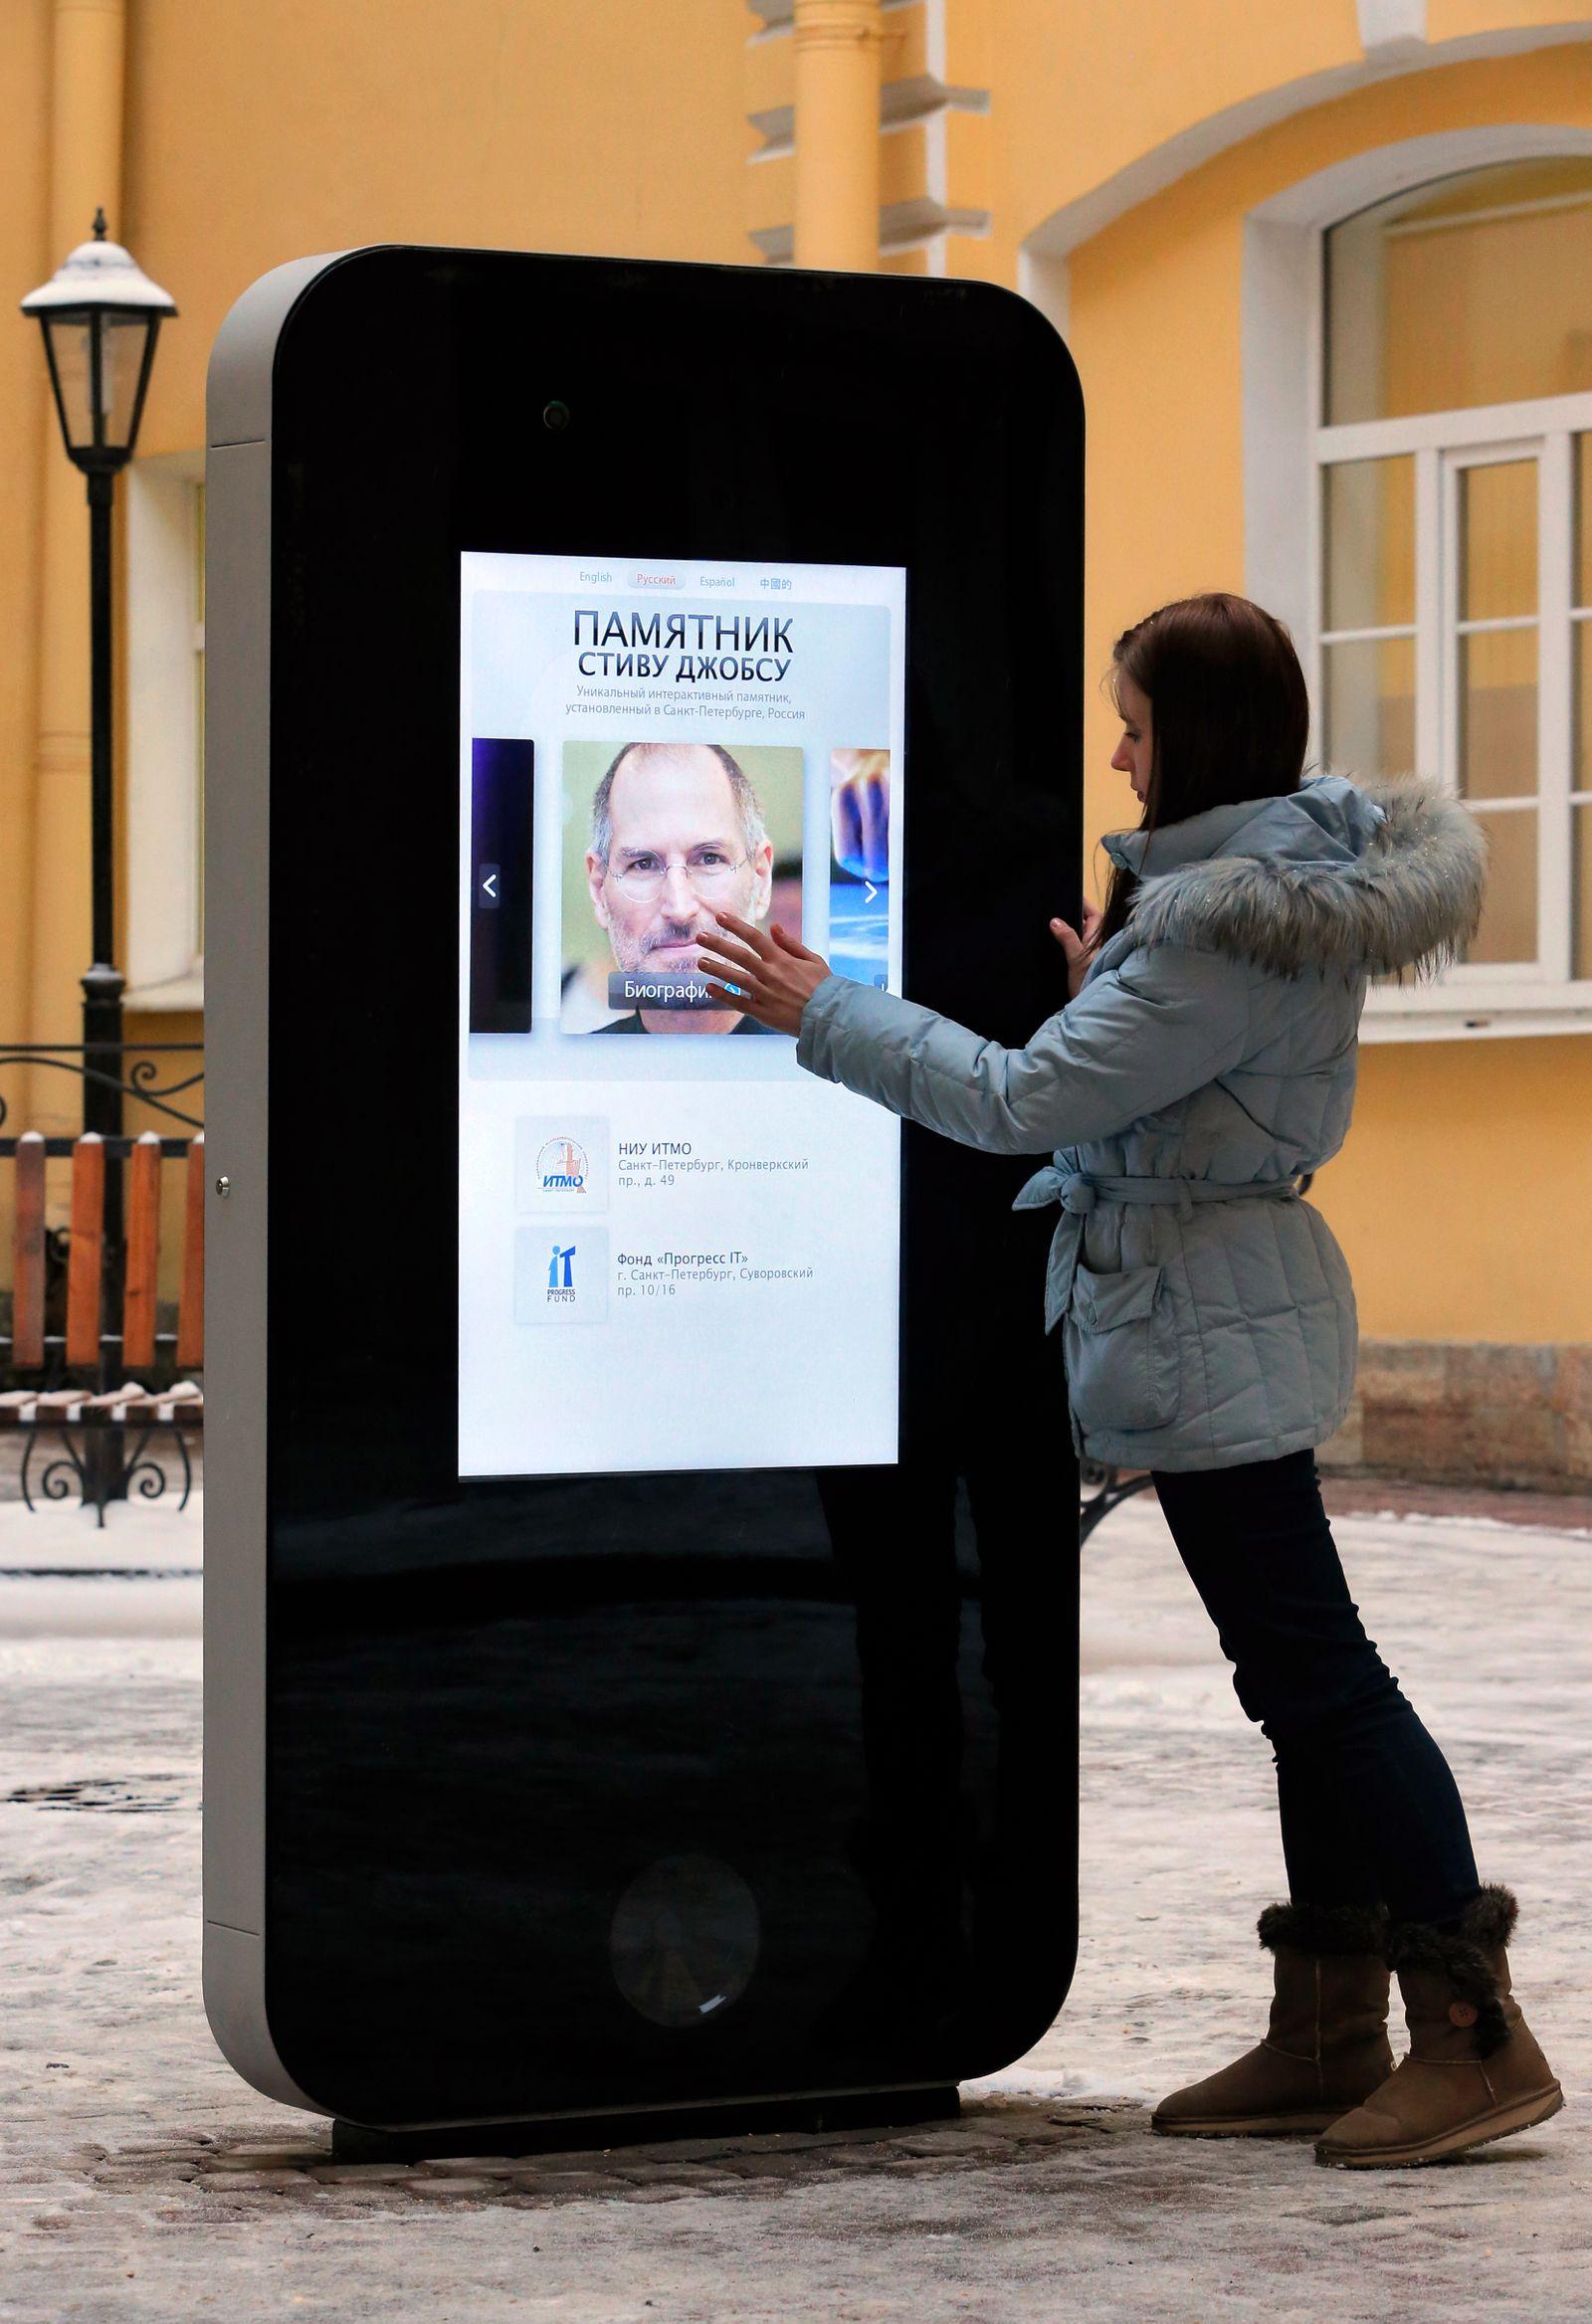 mmo St. Petersburg Universität/ Steve Jobs Denkmal (Kopie)